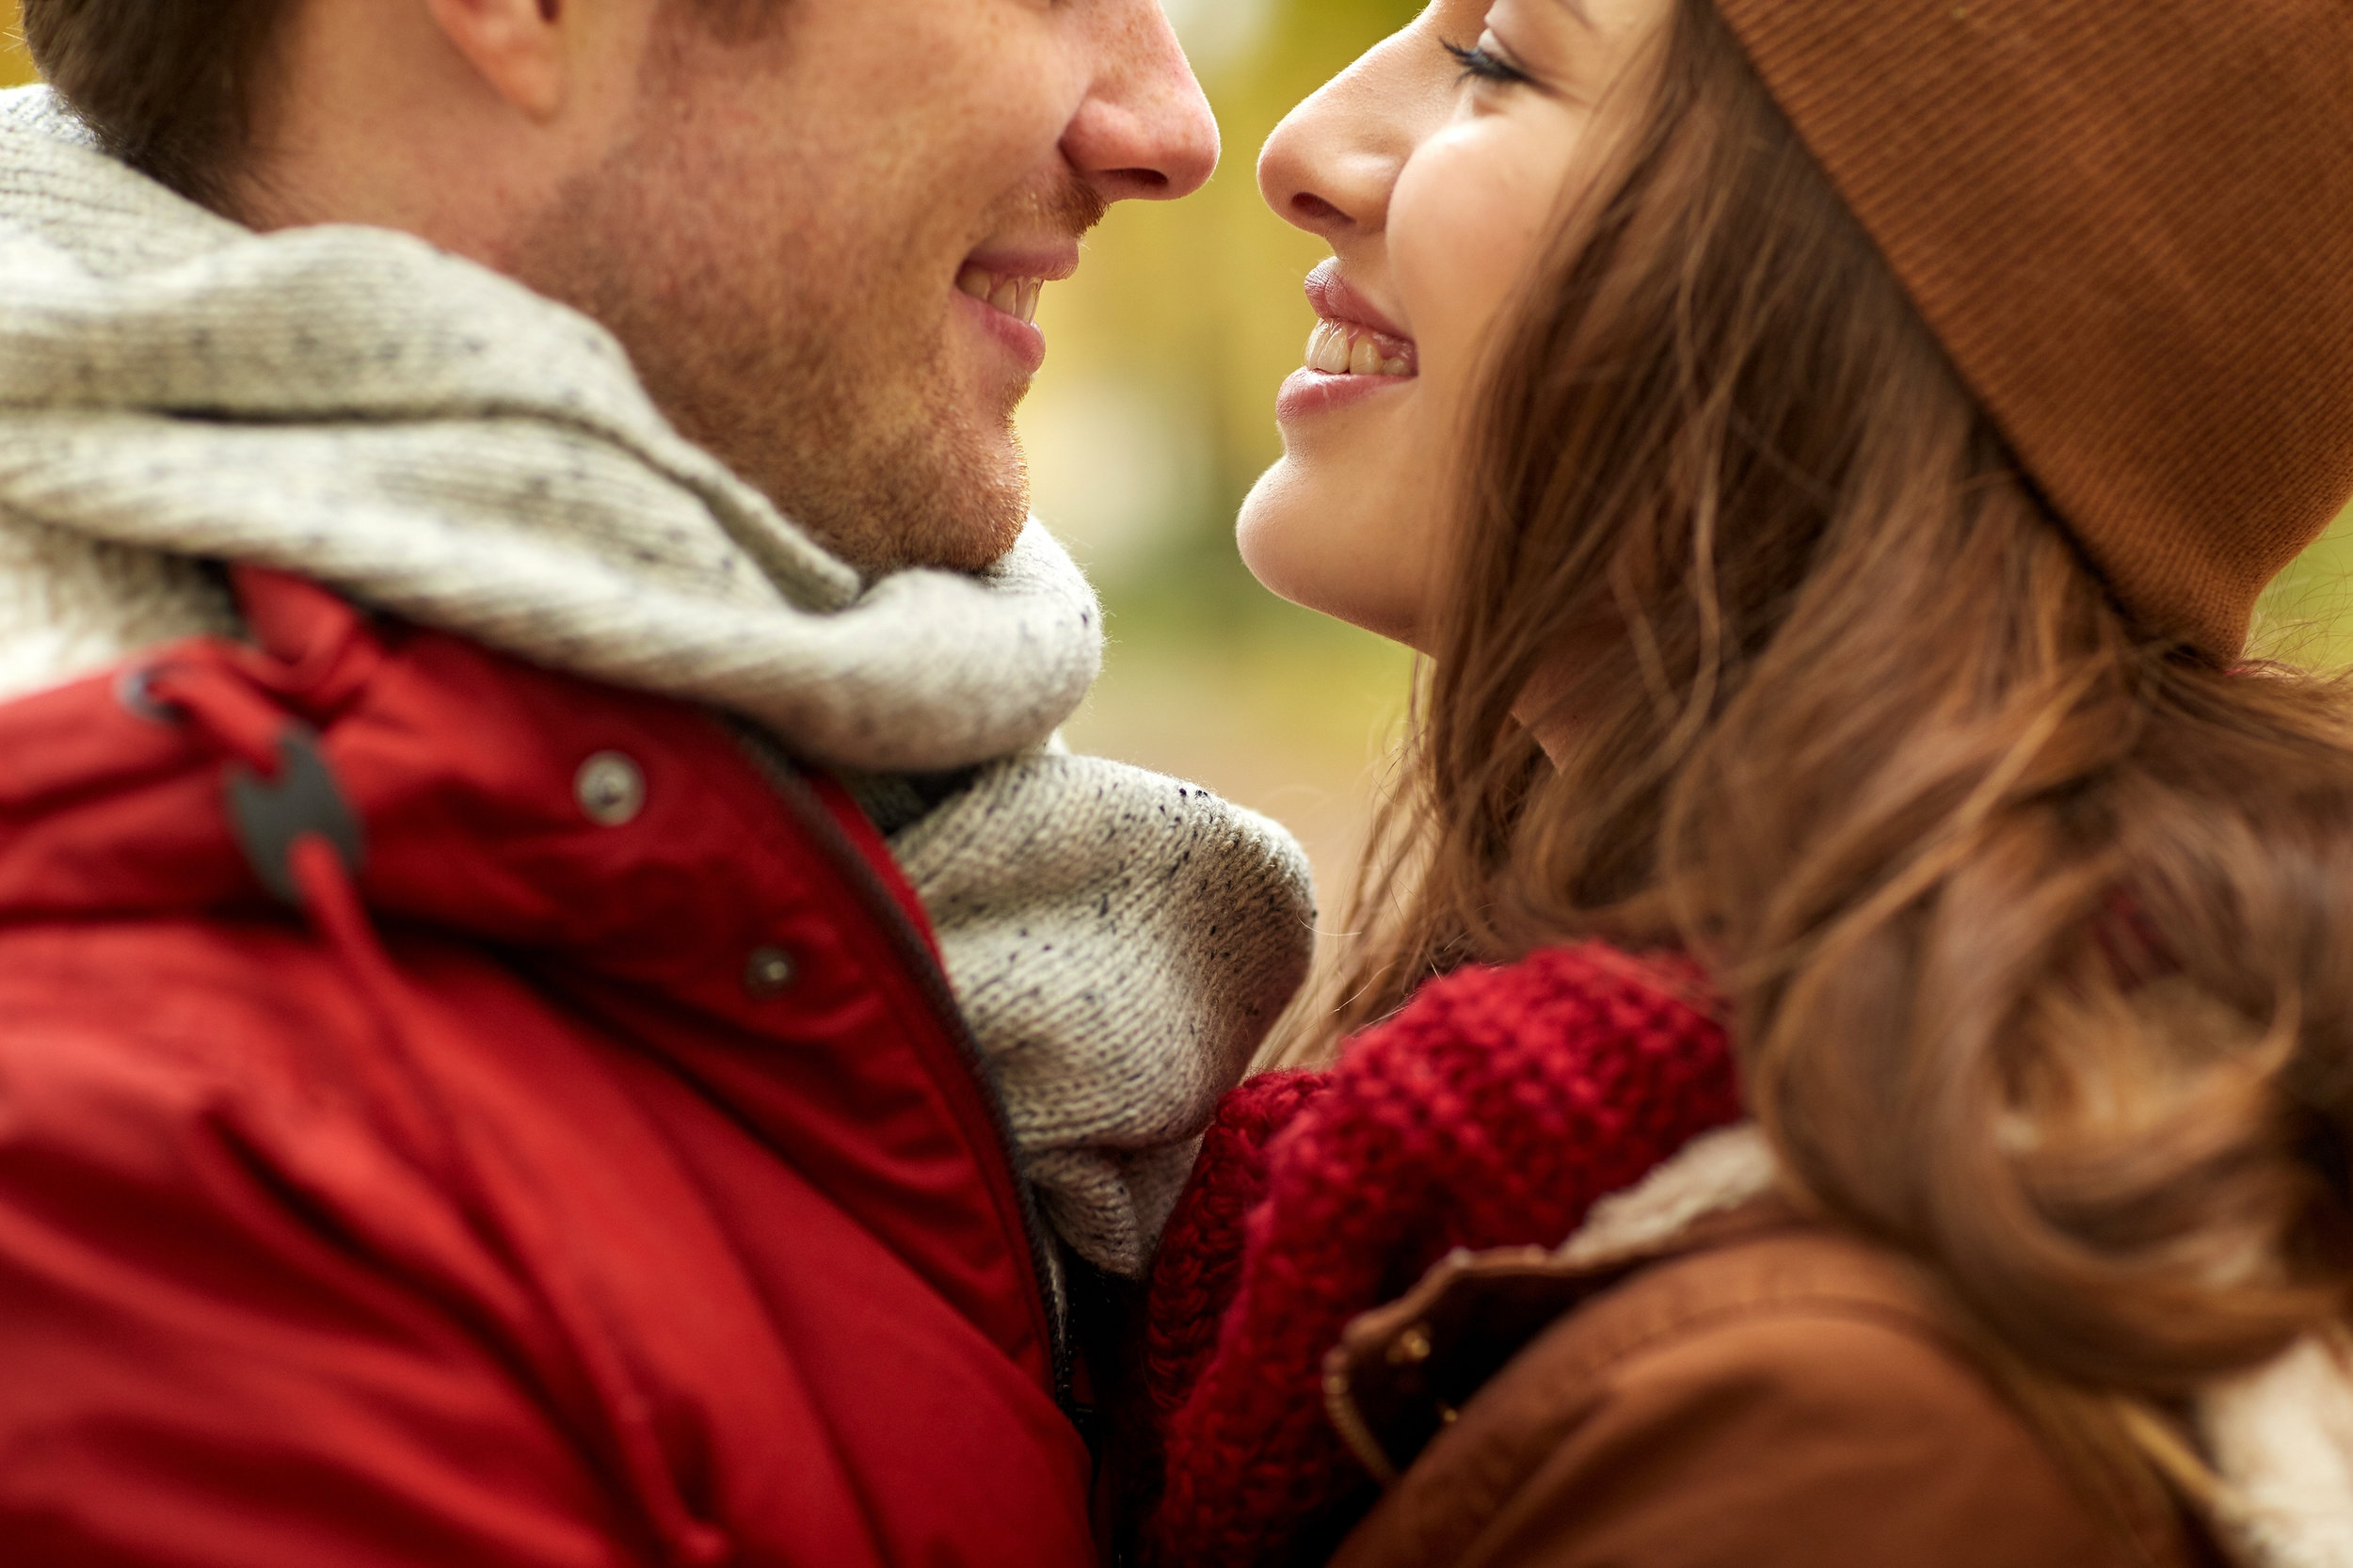 bigstock-love-relationships-season-an-155835890.jpg